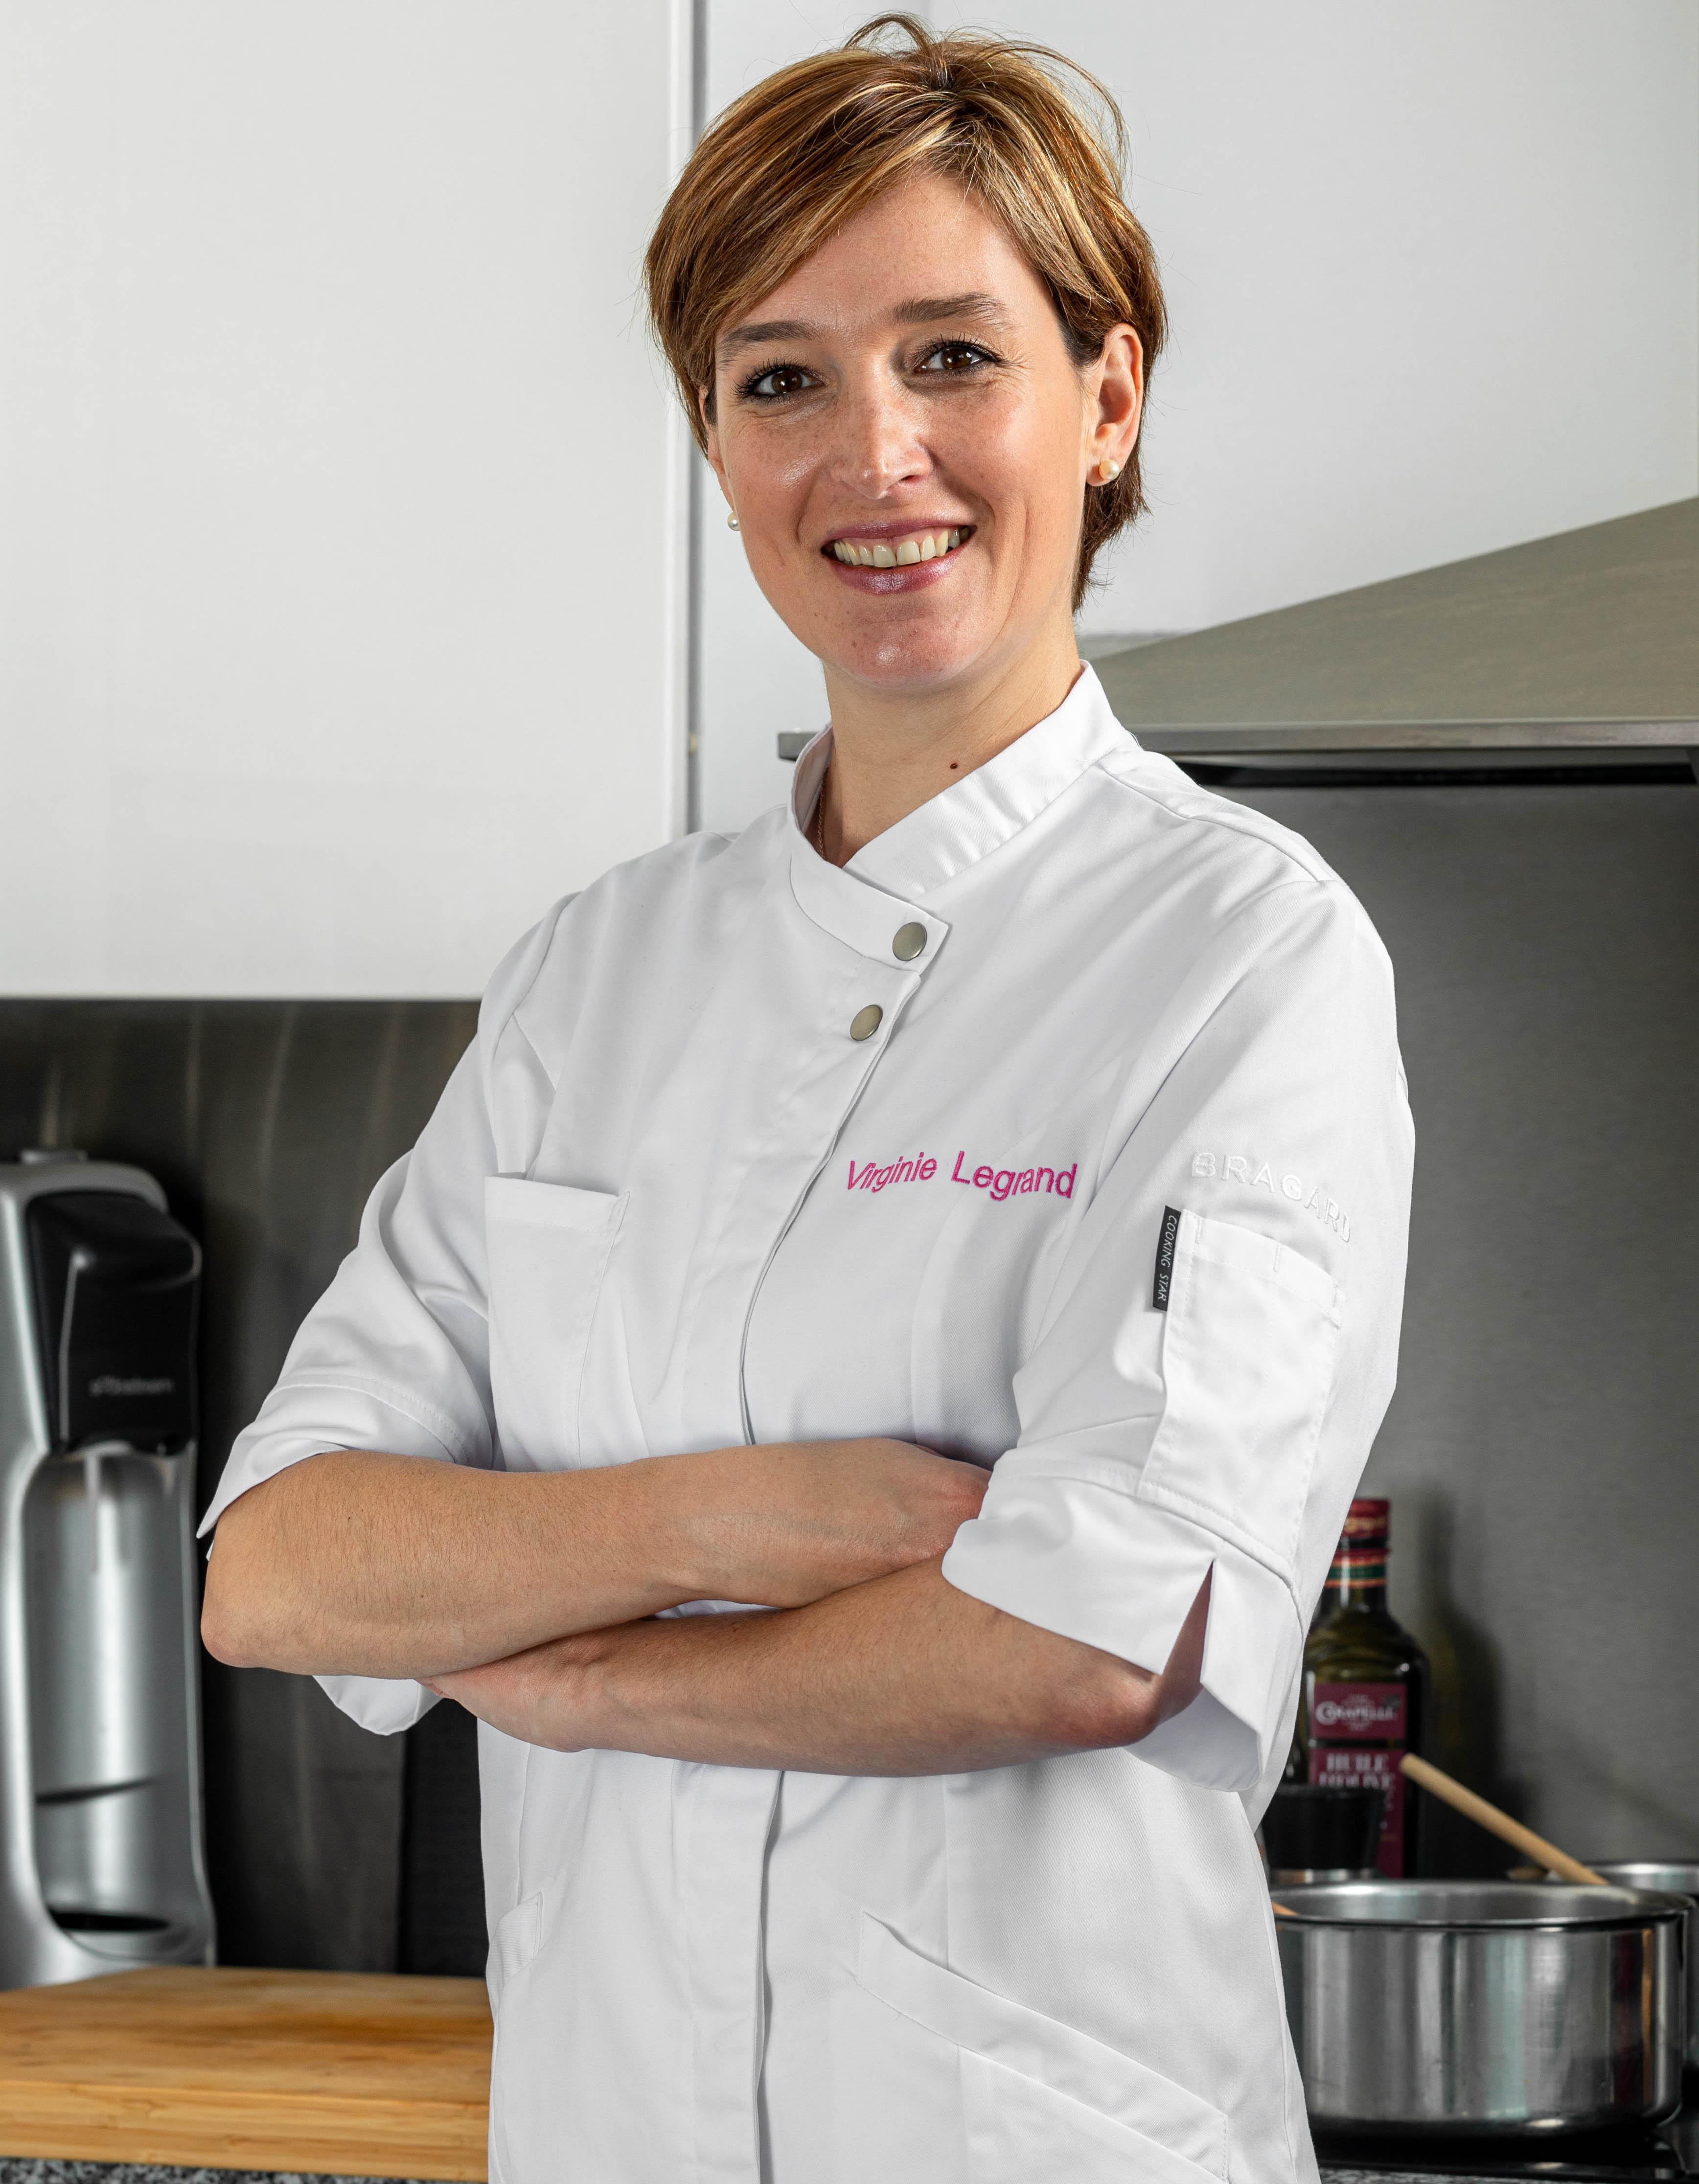 Virginie Legrand - Veste de cuisine femme VERANA